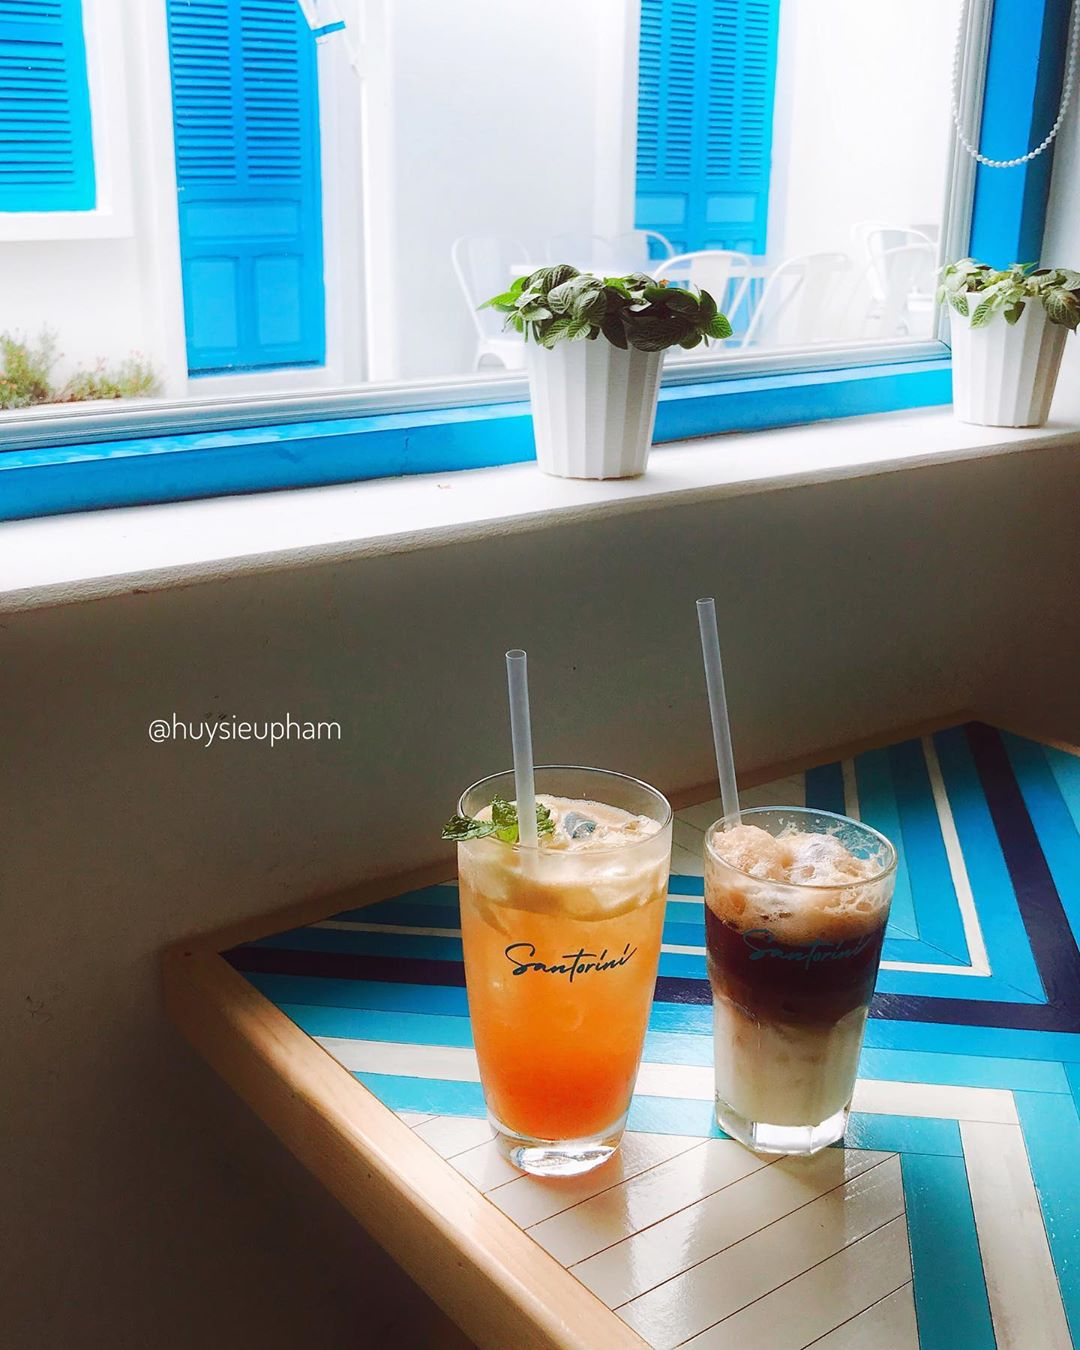 bienhoa_santorini-coffee-bien-hoa-19